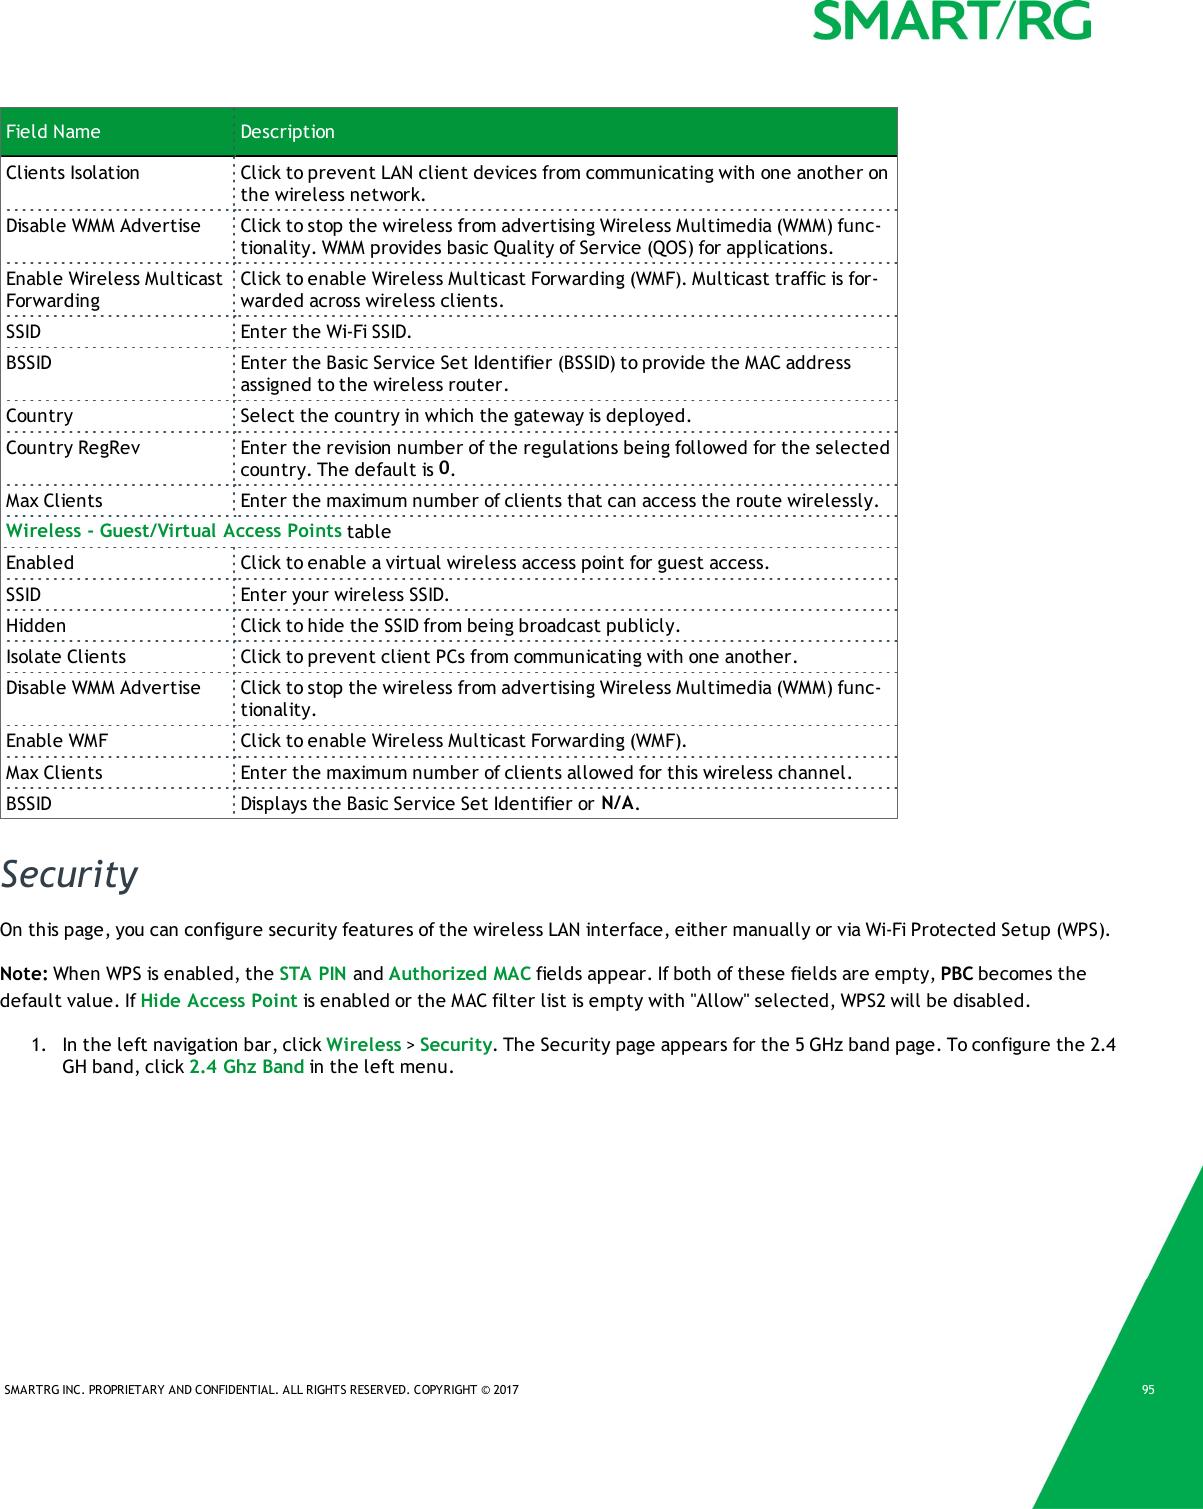 SmartRG SR700A 802 11ac LTE/VDSL2 GATEWAY User Manual My